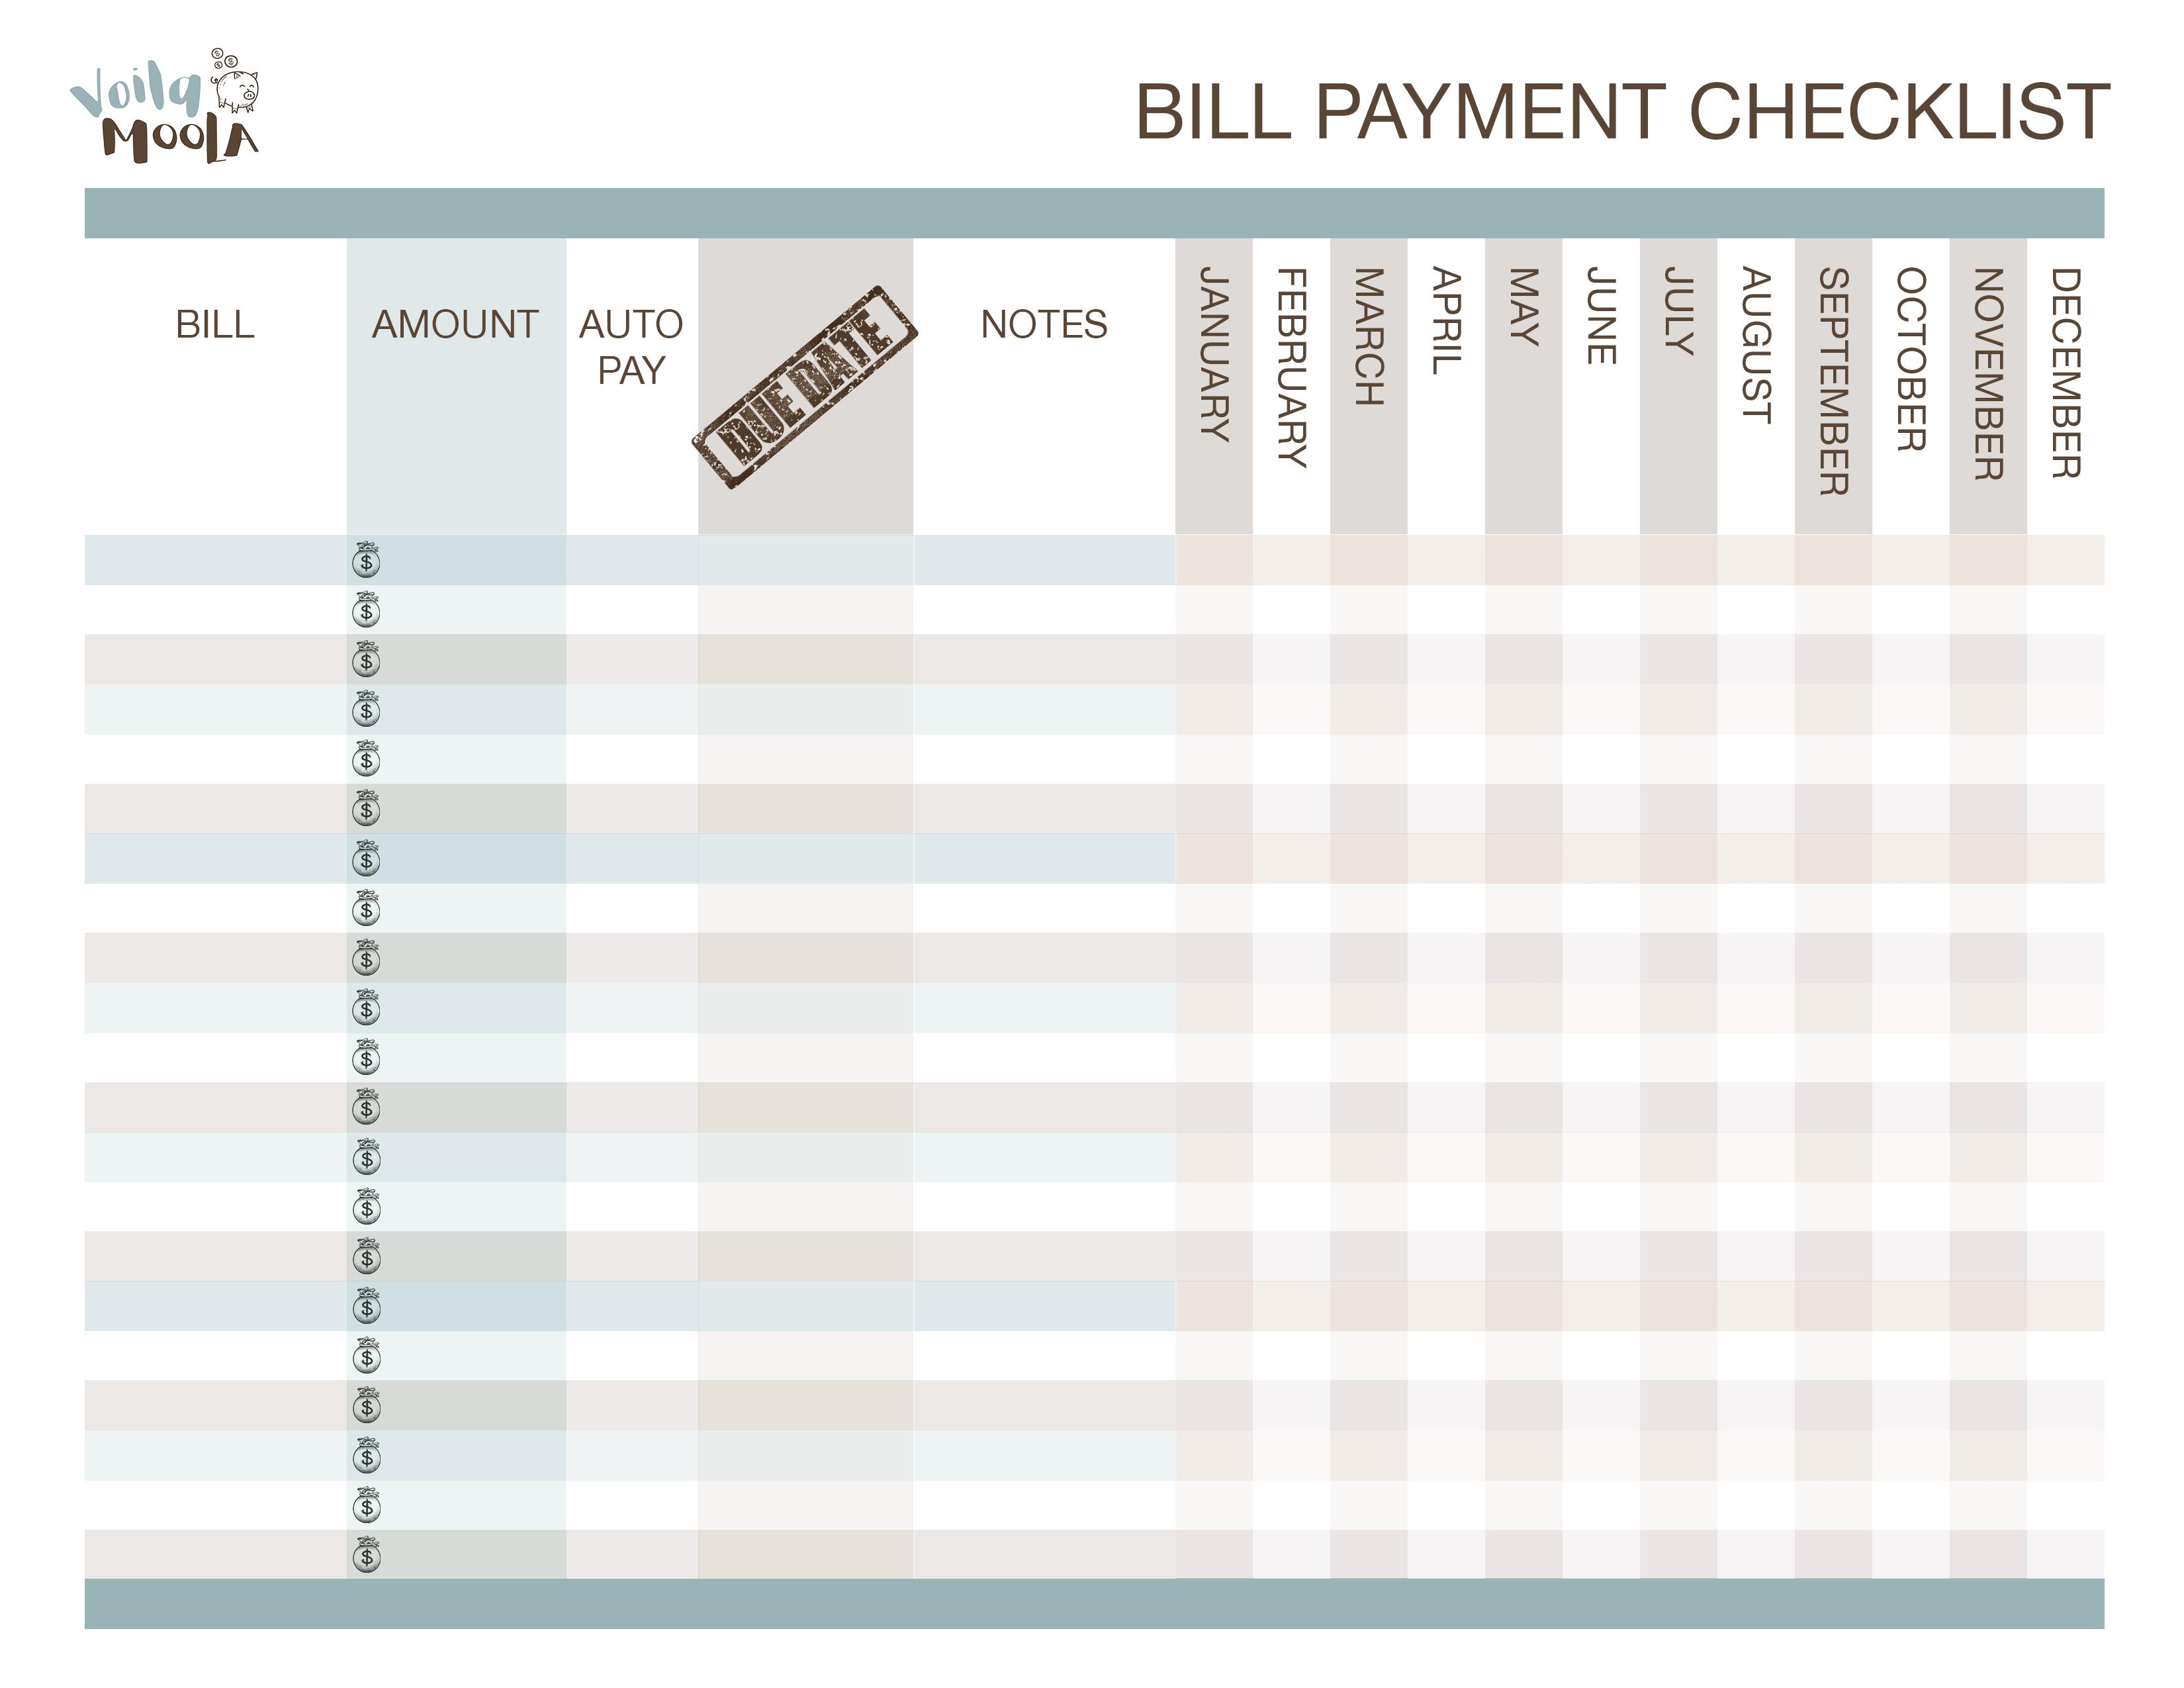 bill payment checklist voila moola